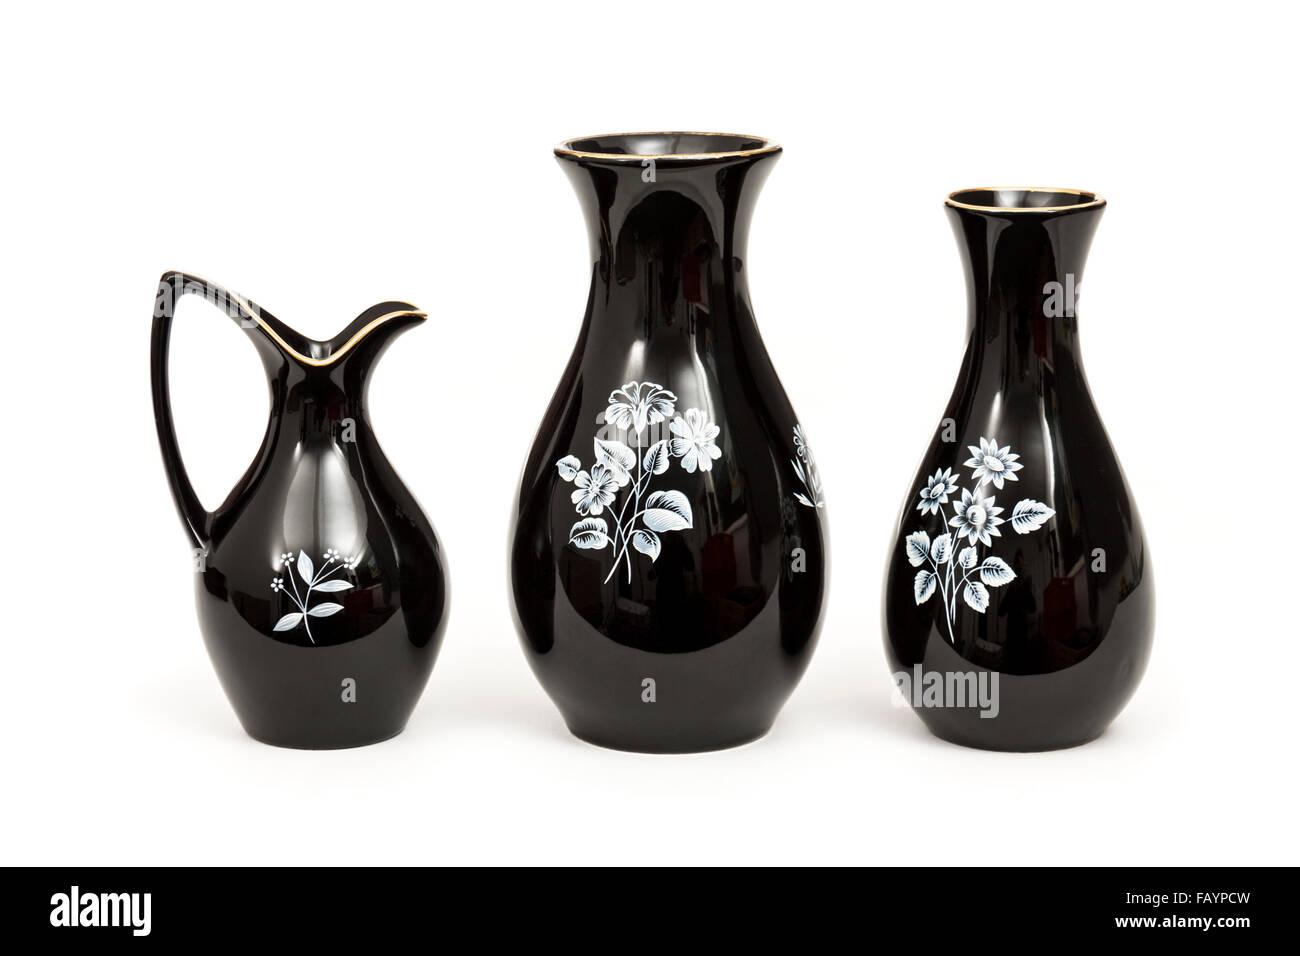 Vintage set of 1960's Wade pottery 'Black Frost' floral vases - Stock Image